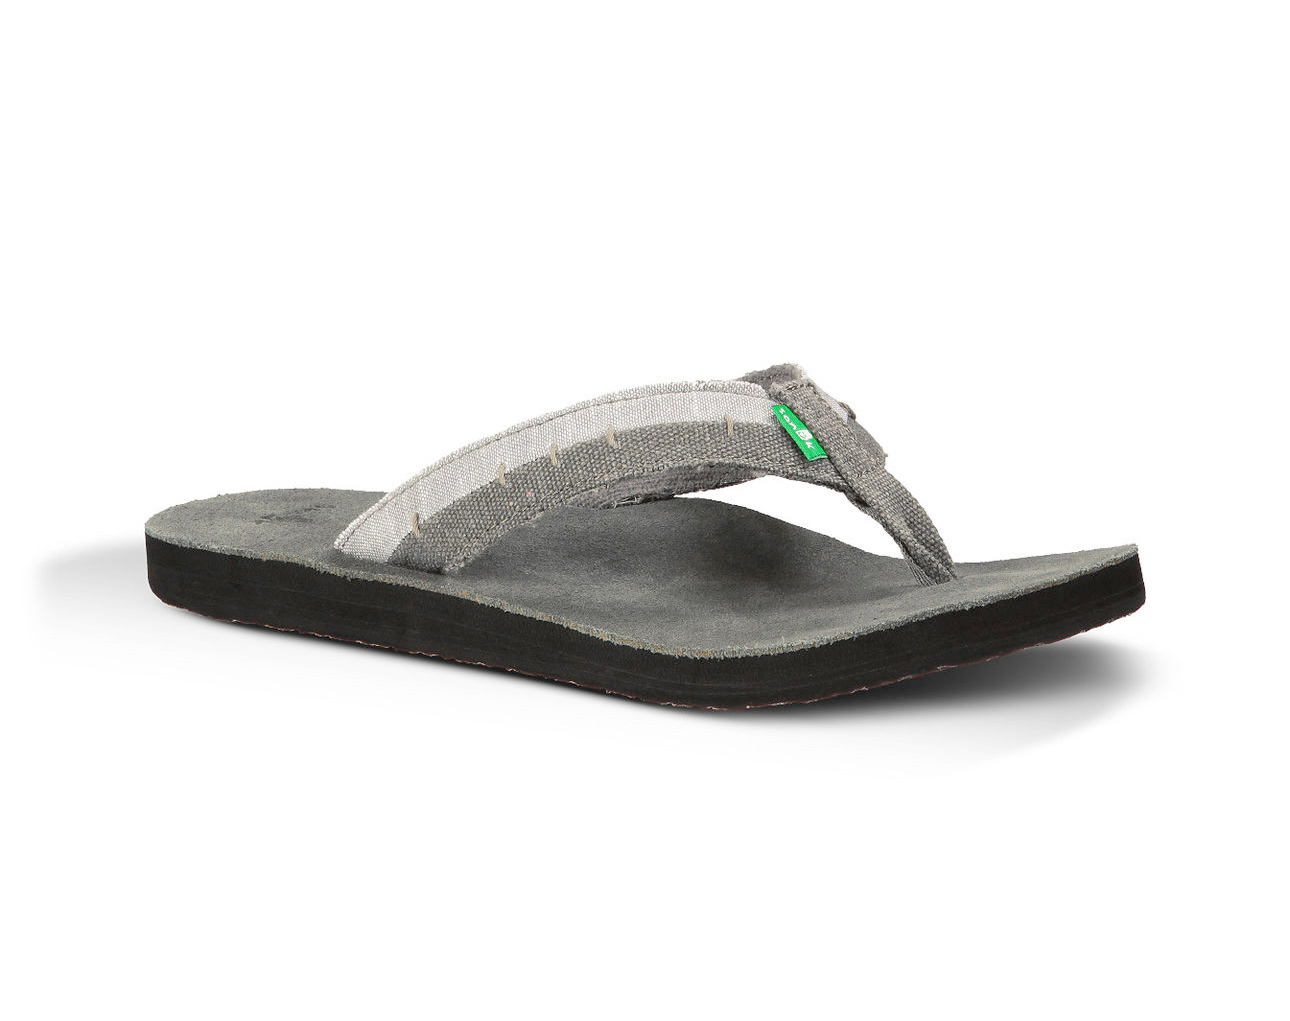 Sanuk-Sandals-Dr-Fray-Flip-Flops-Summer-Beach-